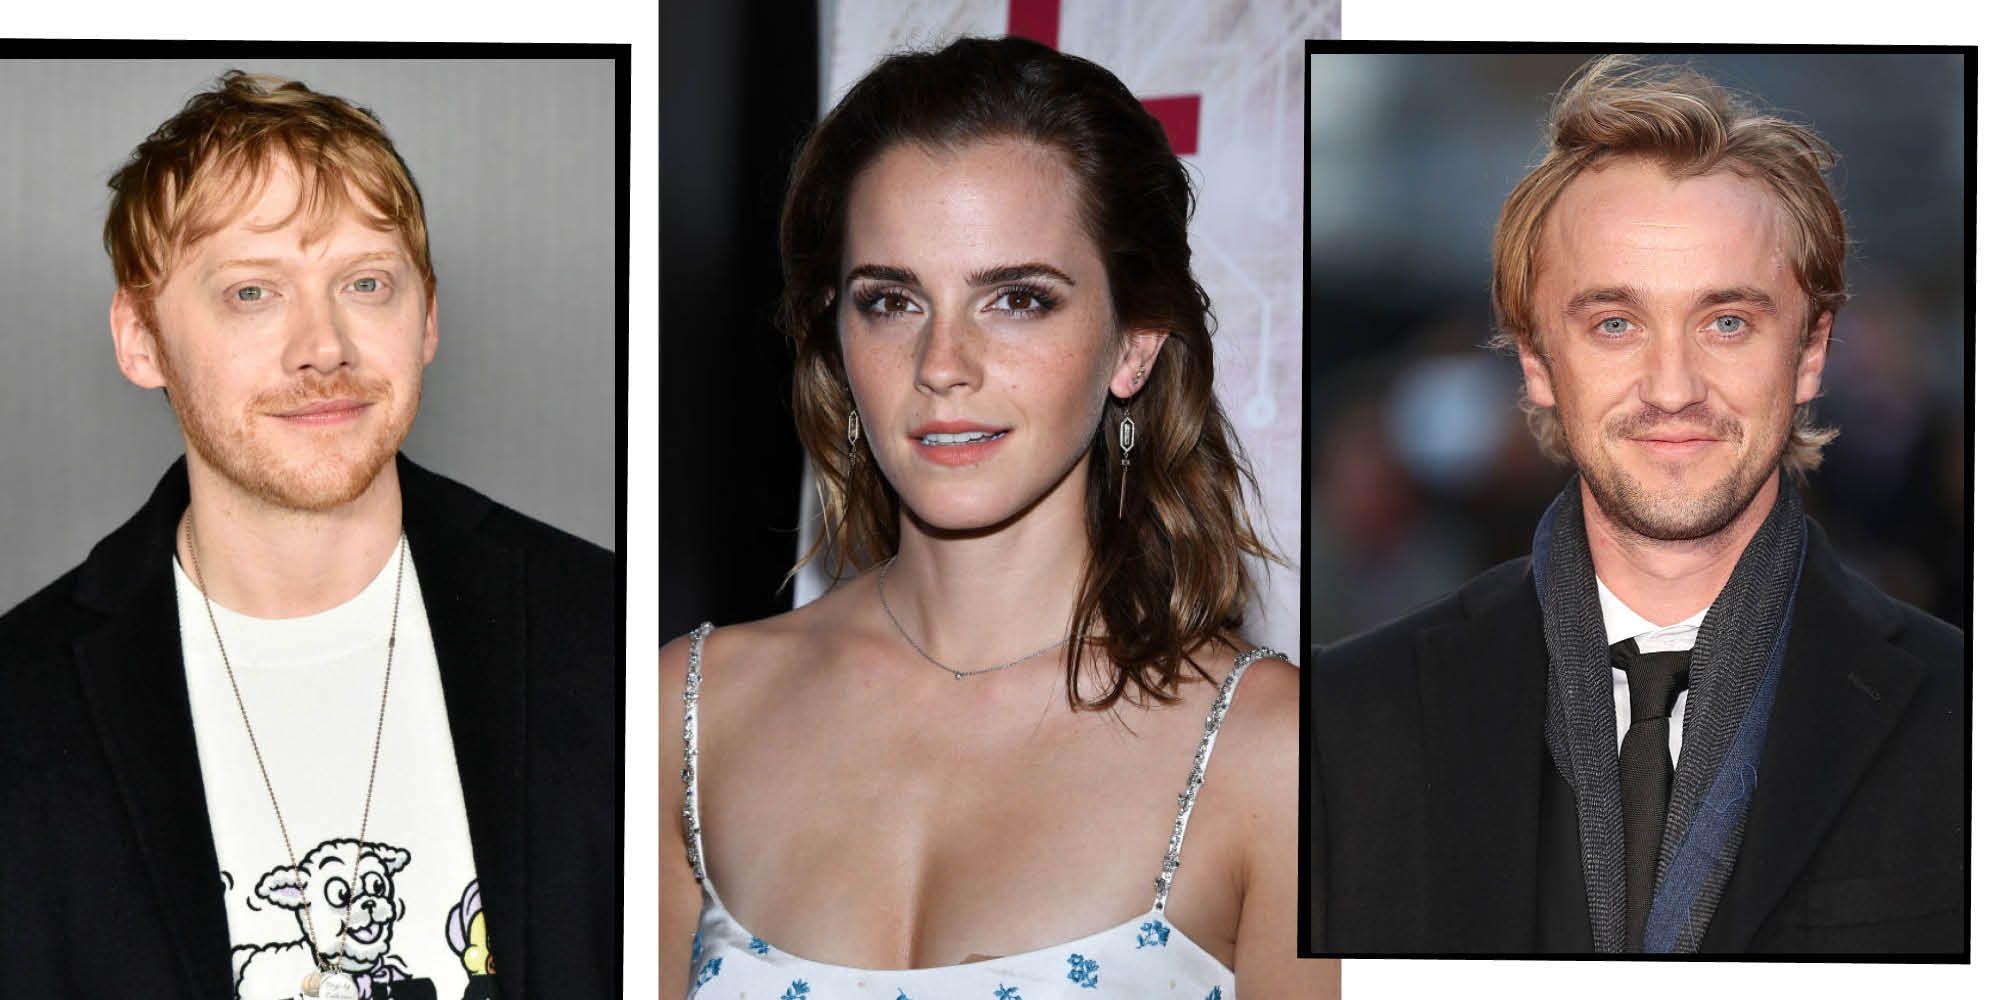 Rupert Grint Confirms 'Harry Potter' Co-Stars Emma Watson And Tom Felton Had A Romantic 'Spark'